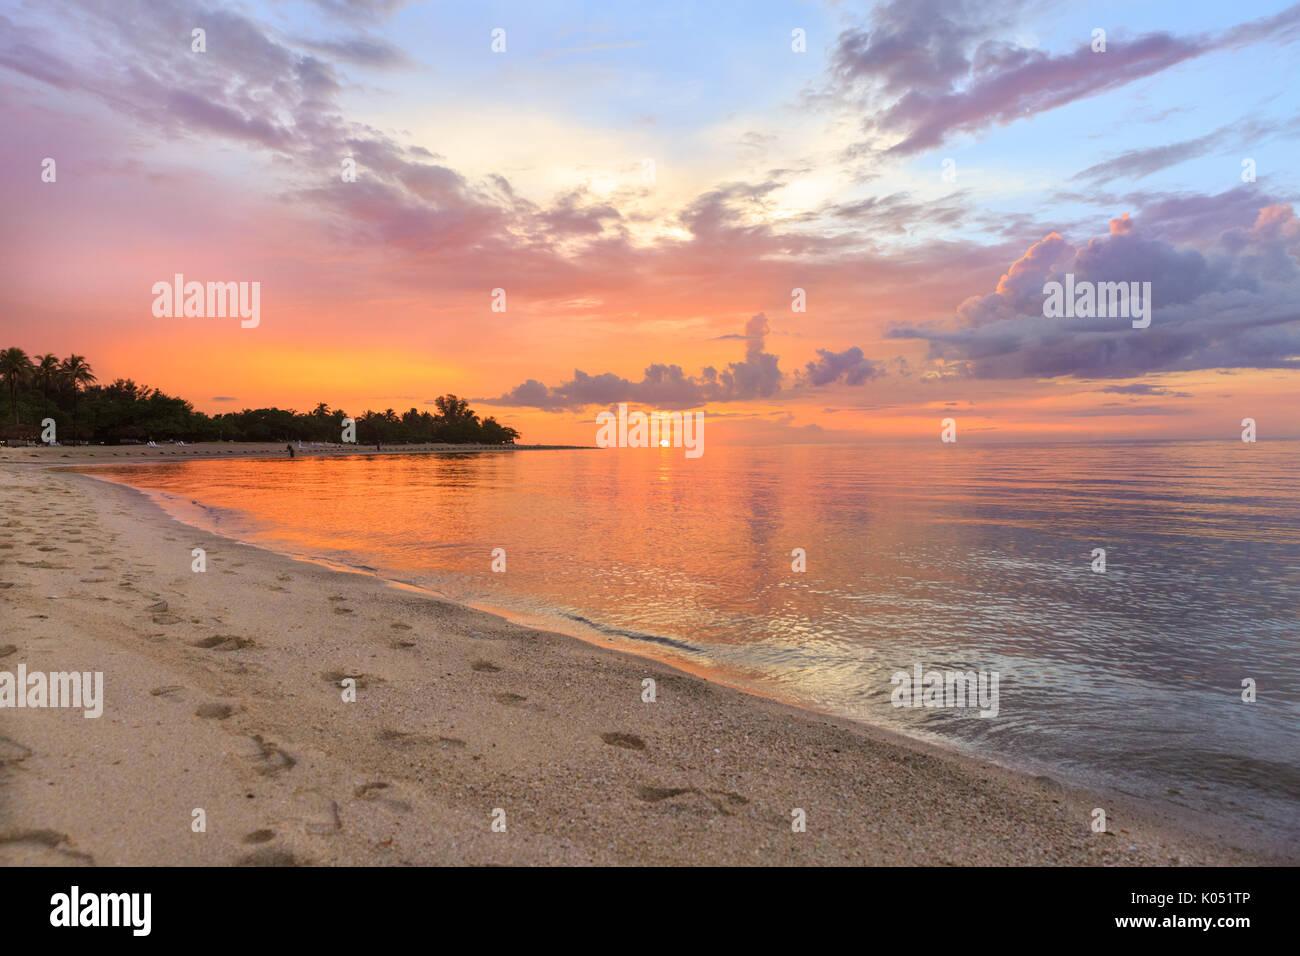 Caribbean sunset, Jibacoa beach and sea, Cuba Stock Photo